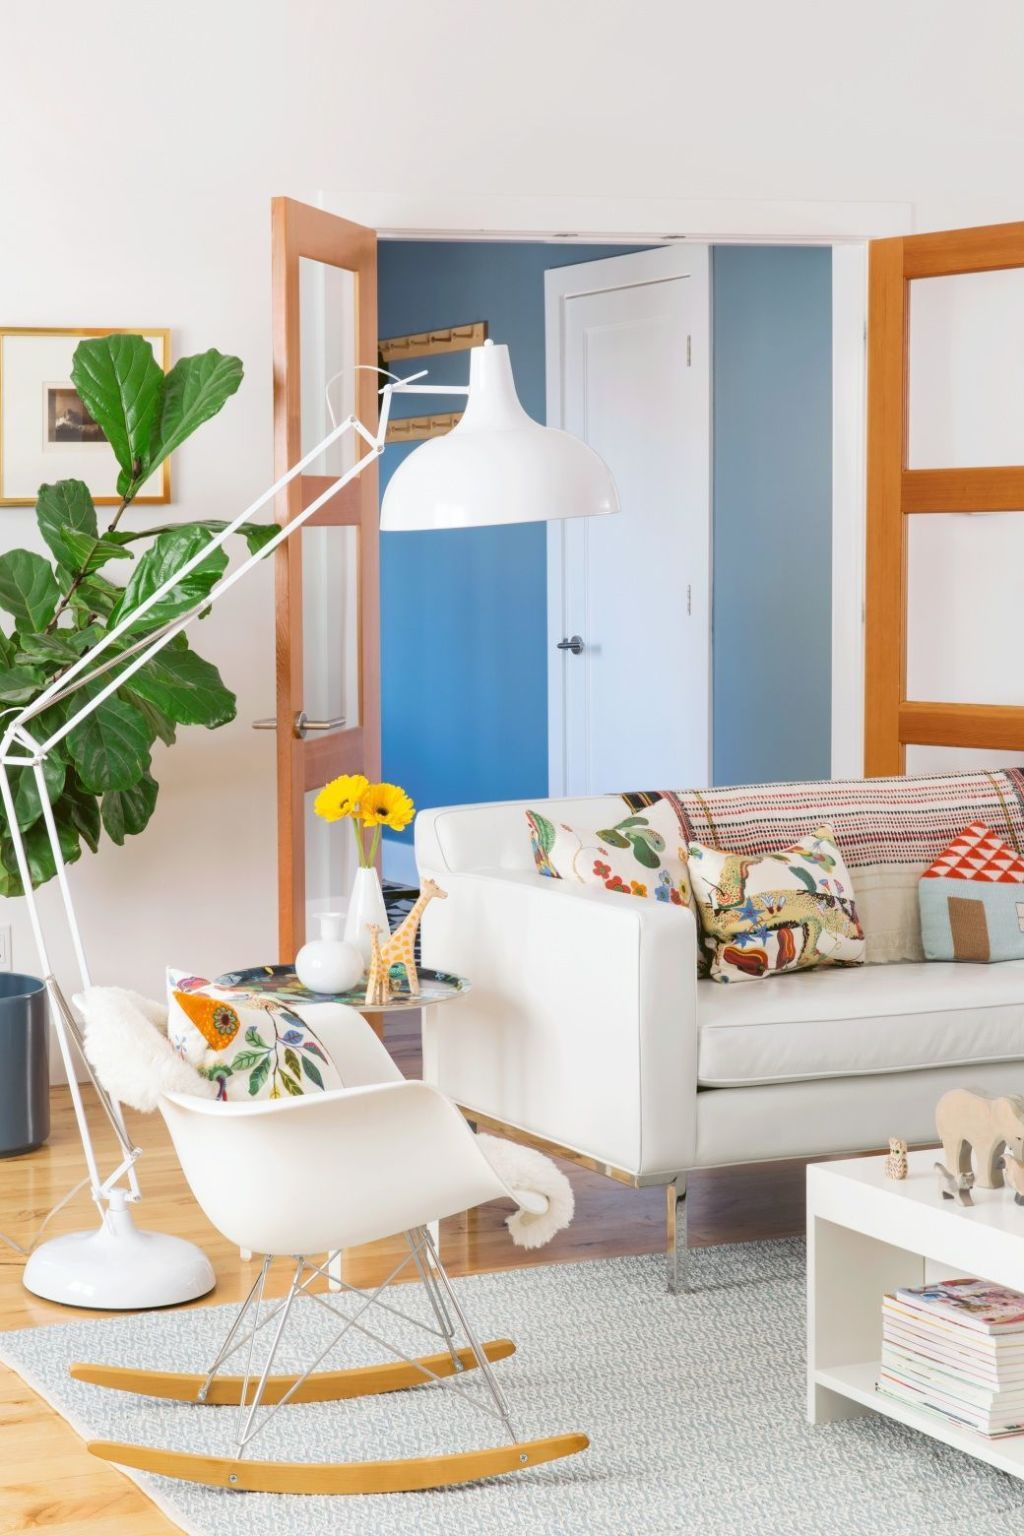 Interior home decorating ideas living room  inspiring living room ideas  living rooms room and office playroom